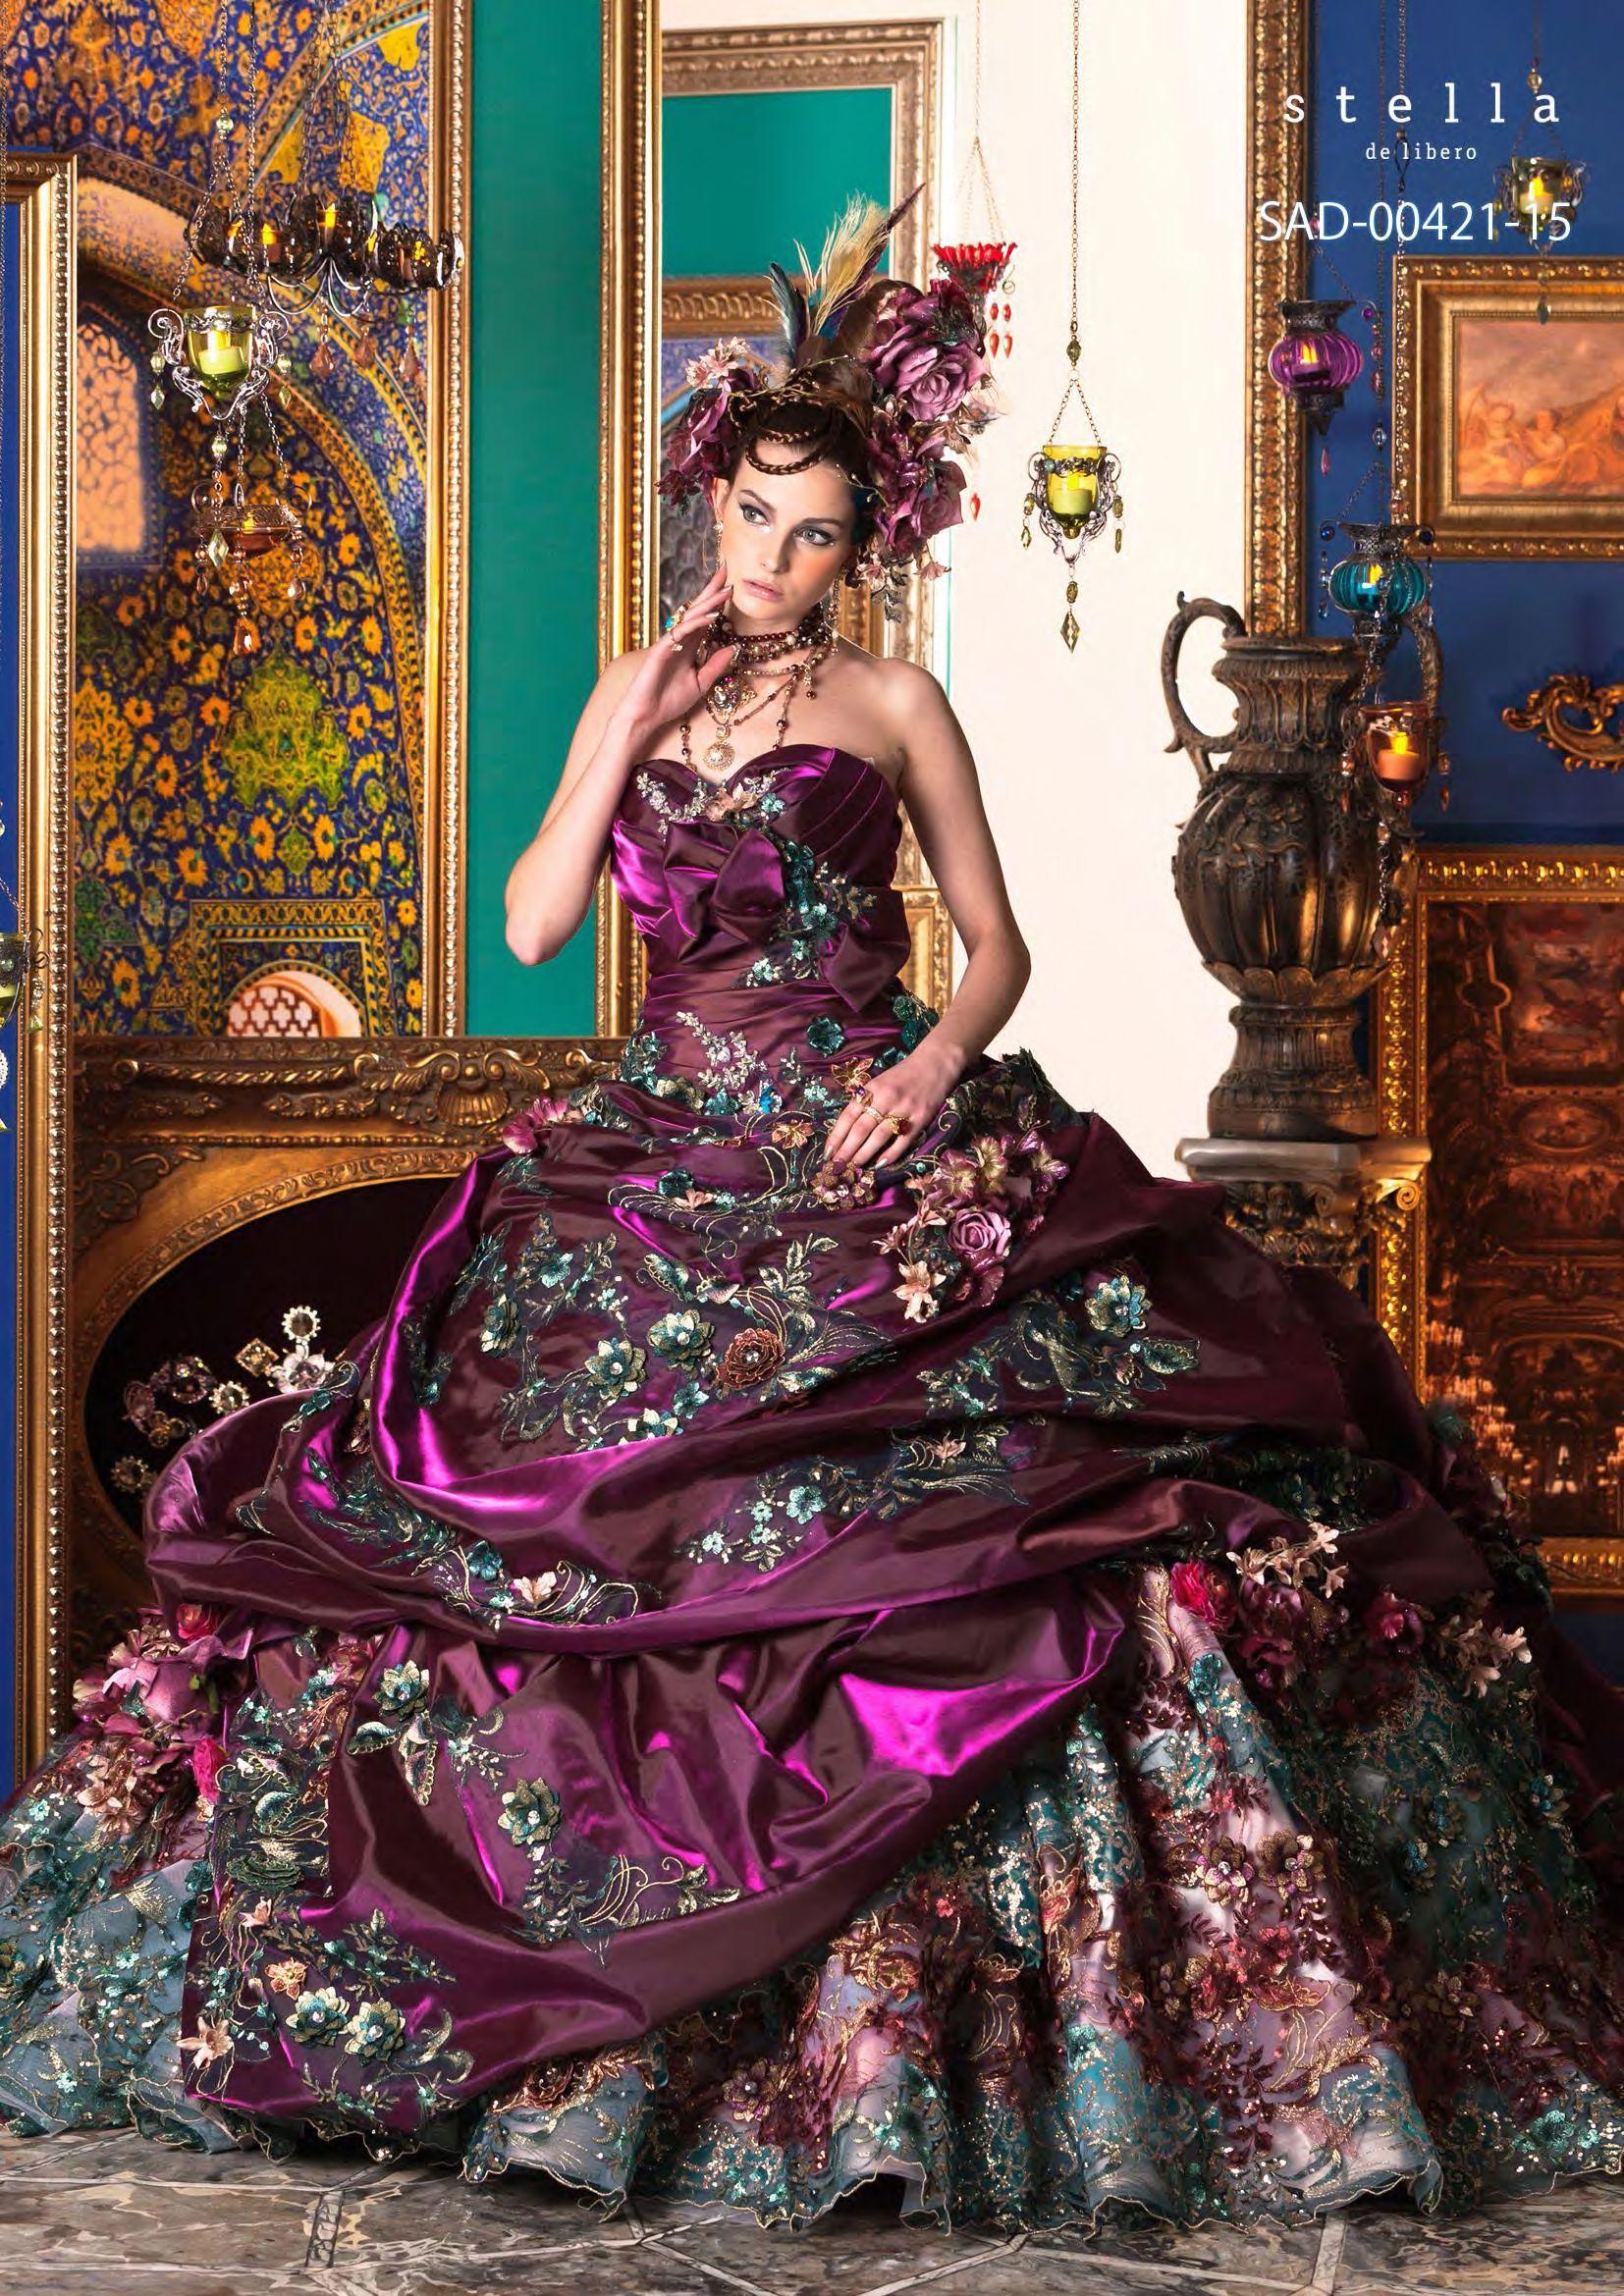 82b583008b7 Pin by Elaine Giggi on Stella de Libero--amazing gowns